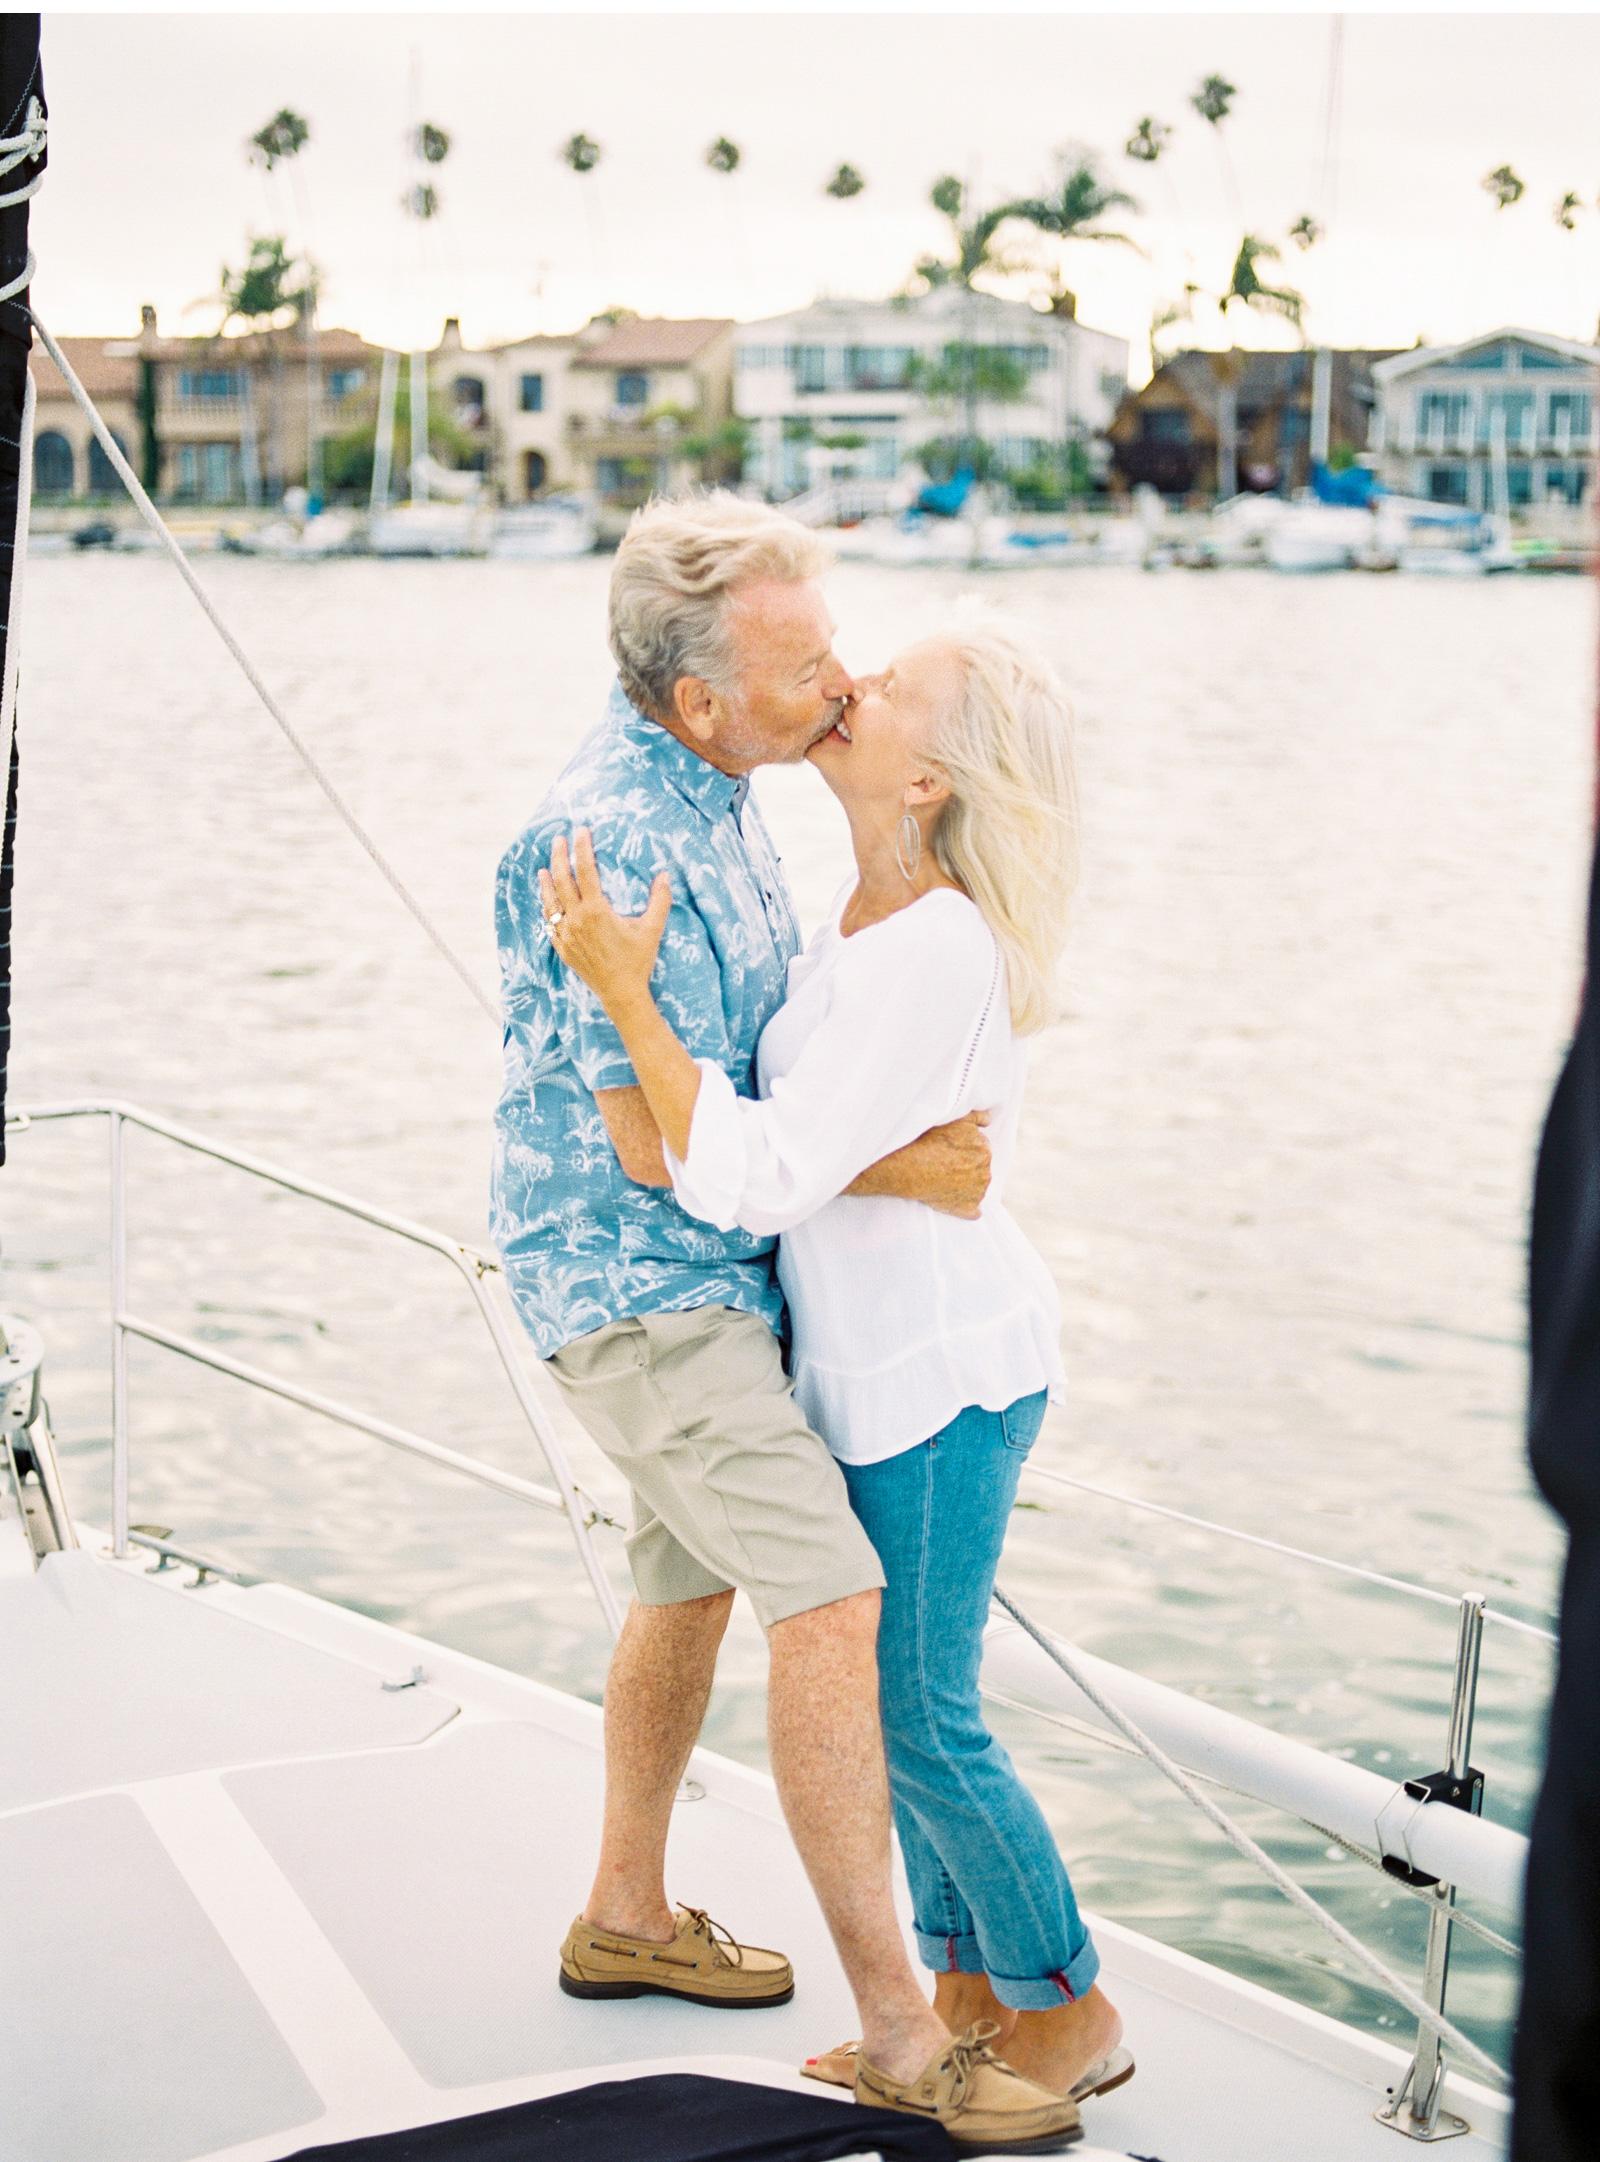 Anniversaries-on-the-Water-Long-Beach-Anniversary-Southern-California-Wedding-Photographer-Fine-Art-Wedding-Photos-Anniversary-on-Boat-Natalie-Schutt-Photography_01.jpg